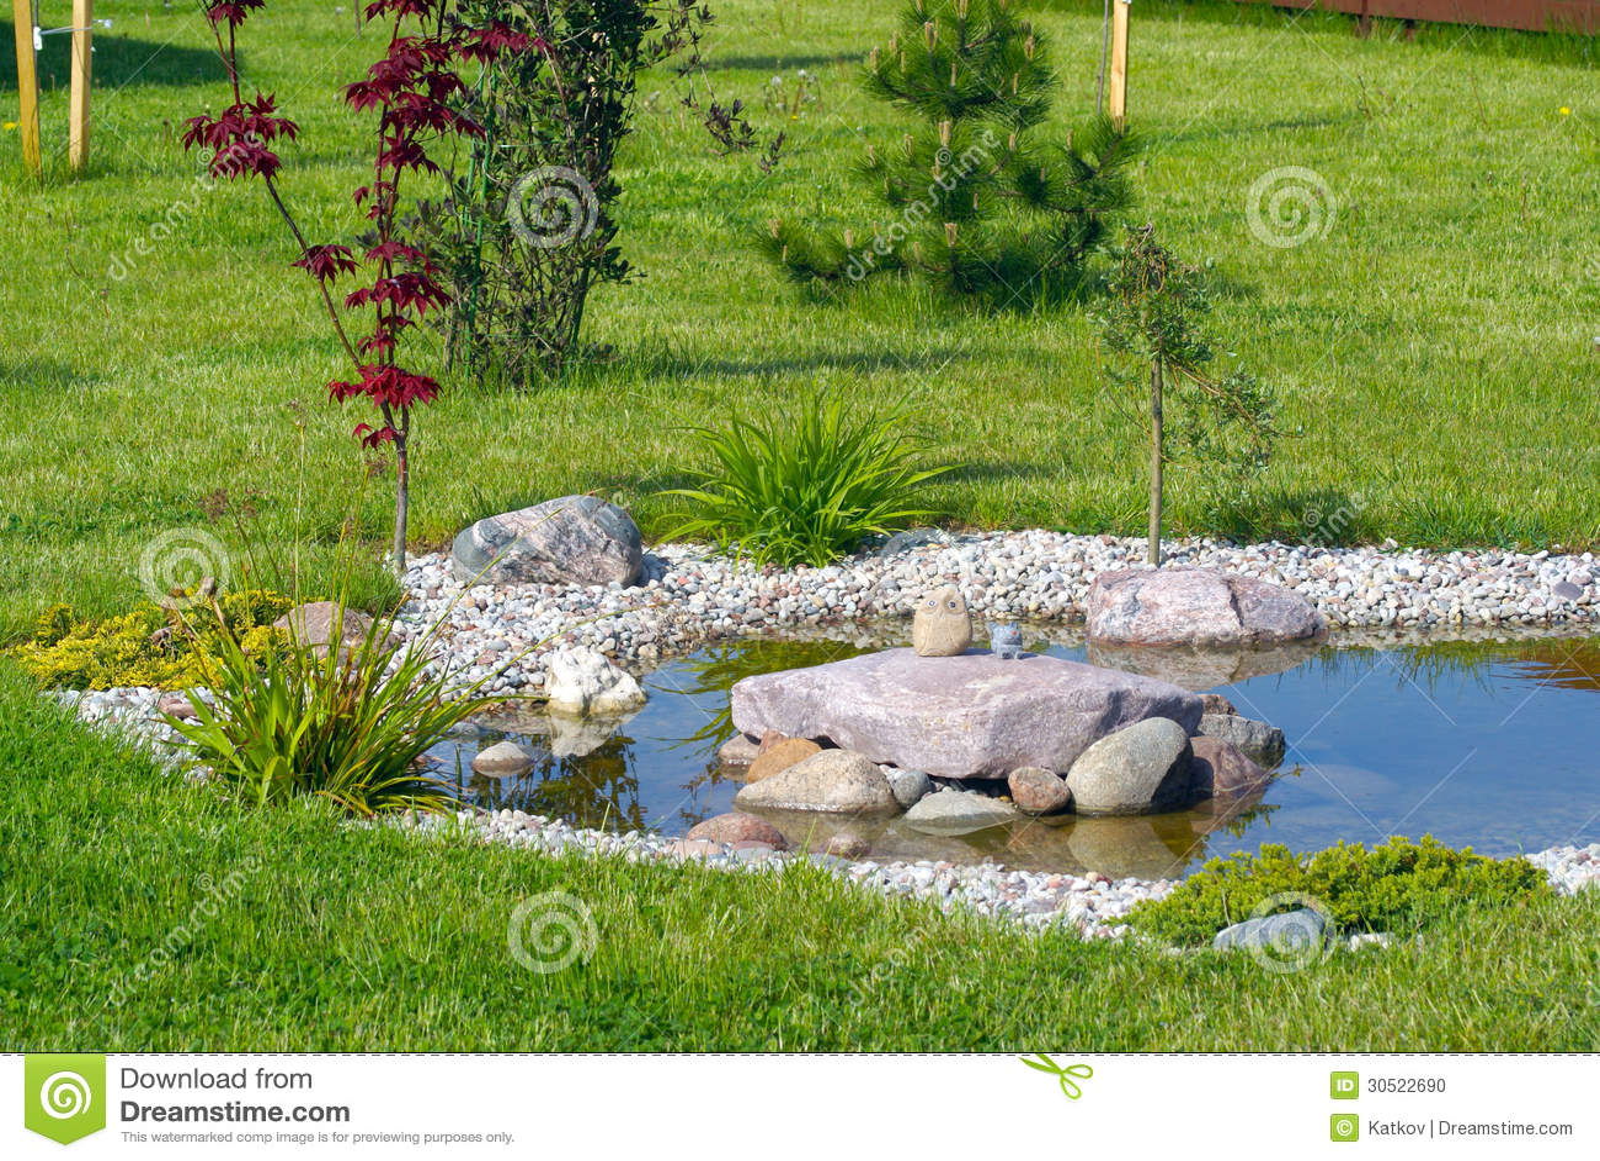 Garden pond stock photo image 30522690 for Garden pond management